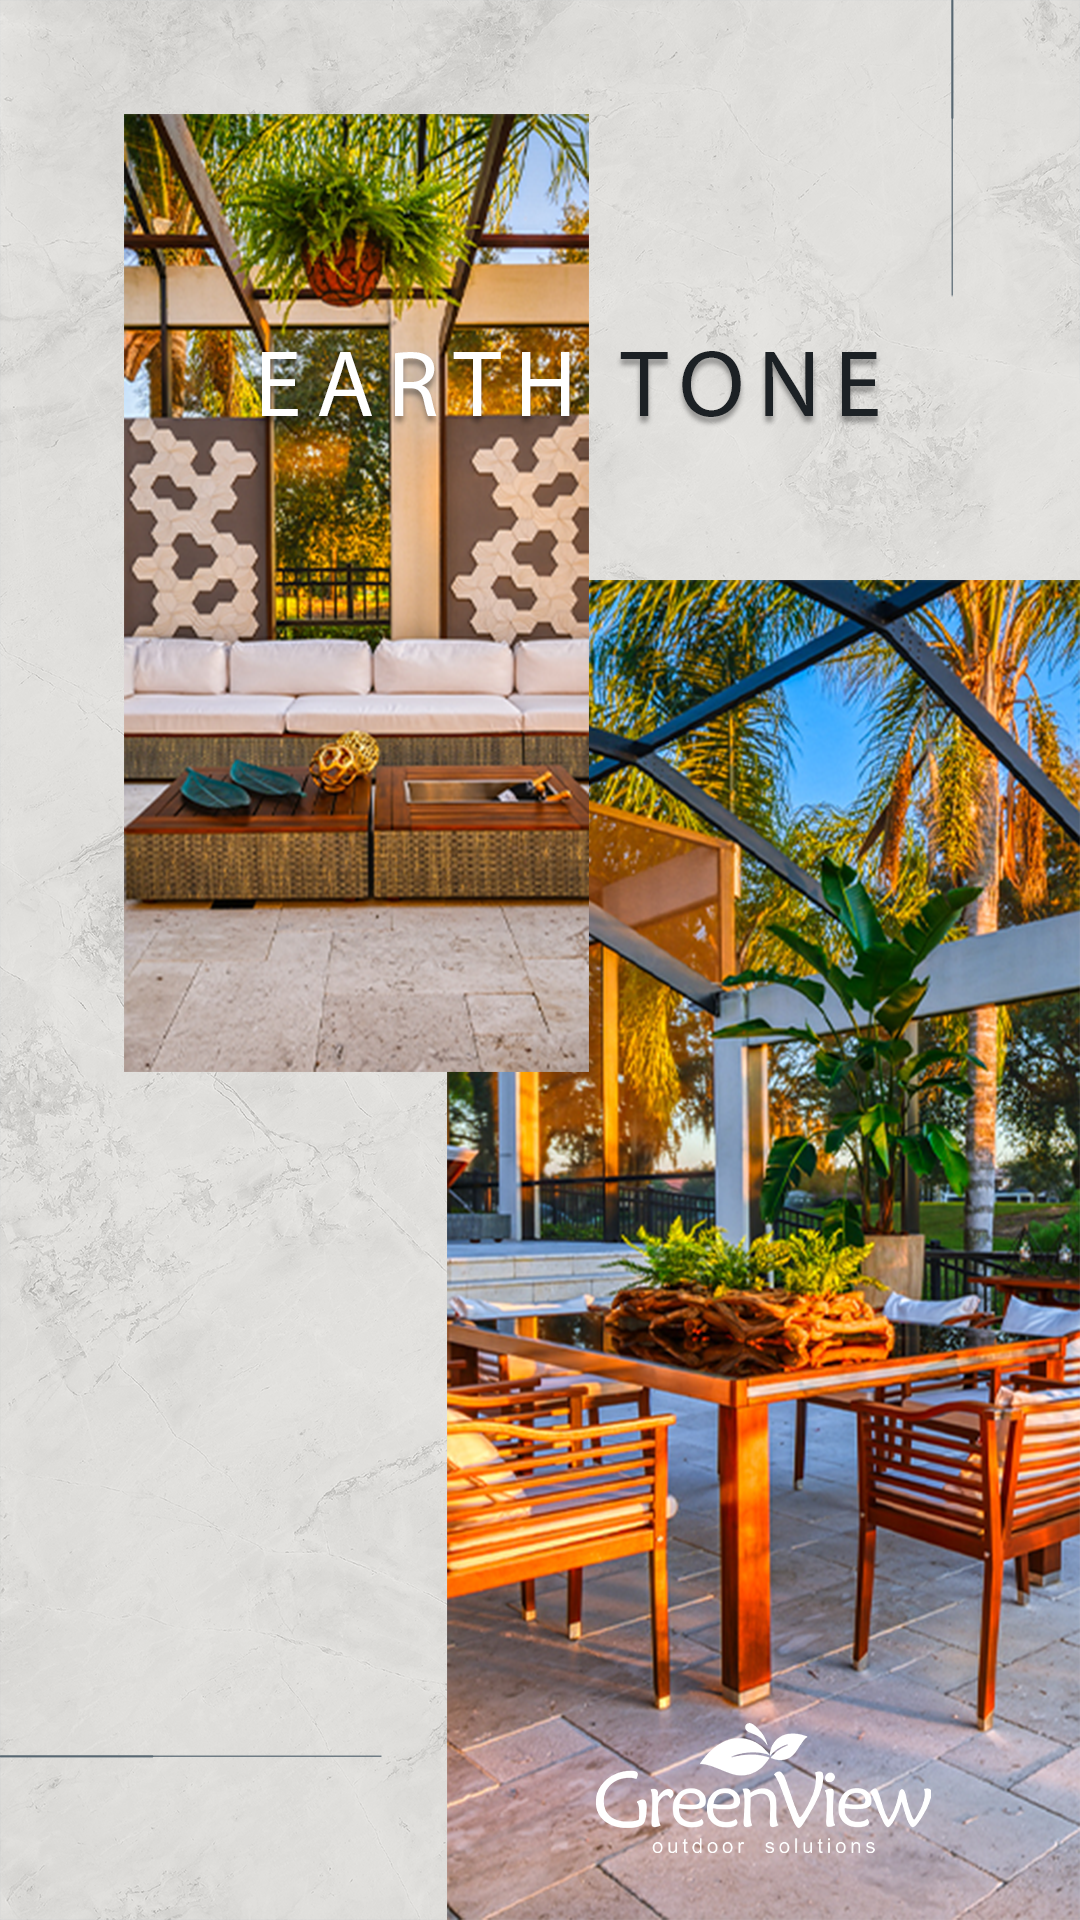 Inspiracaododia Inspiration Pergola Greenviewoutdoor Orlando Florida Miami Garden Summerkitchen Innovation Greenview Summer Kitchen Pergola